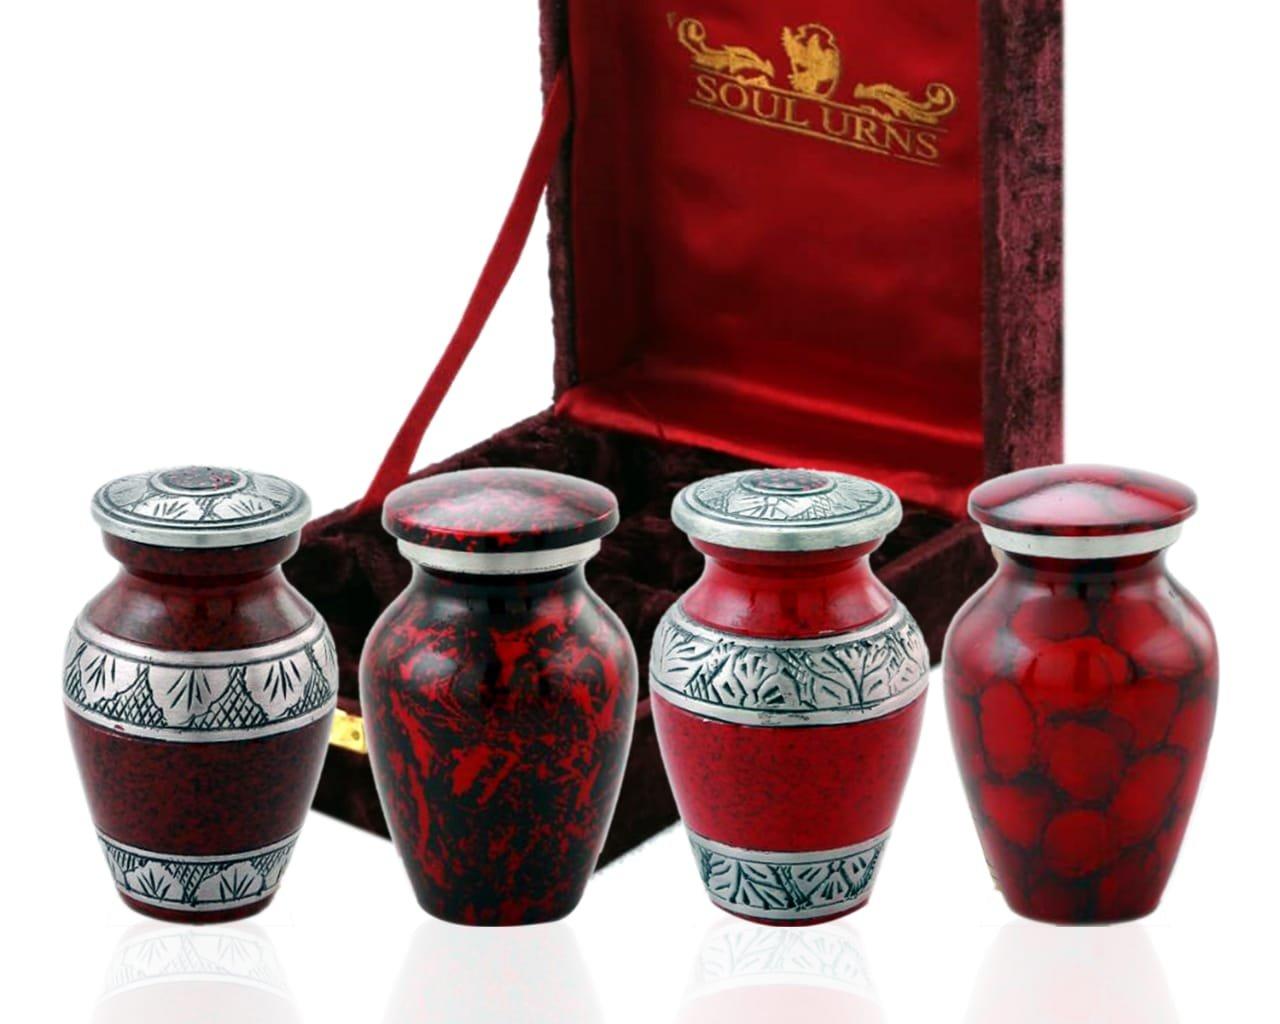 Funeral Keepsake Urns By SoulUrns - Red Small Mini Cremation Keepsake Urns for Human Ashes - Set of 4 - Includes Superb Velvet Urn Case